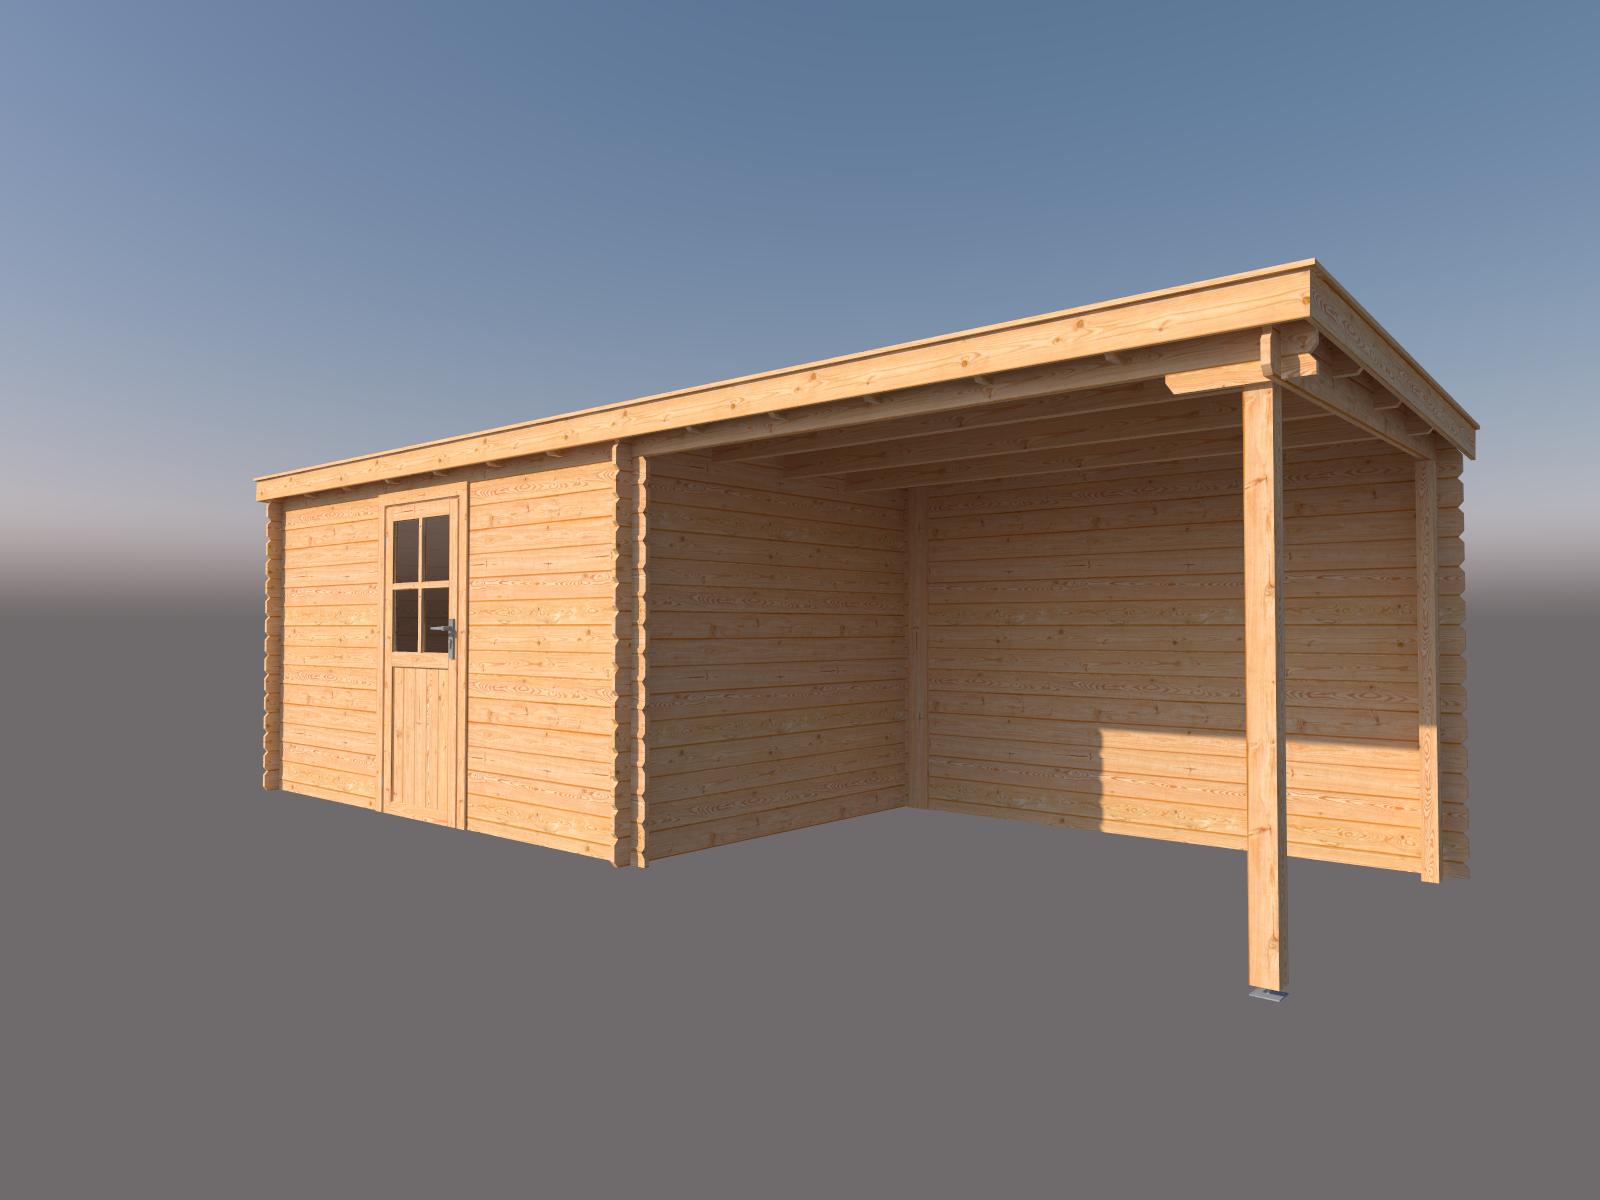 DWF Blokhut met overkapping lessenaar dak 400 x 250 + 300cm